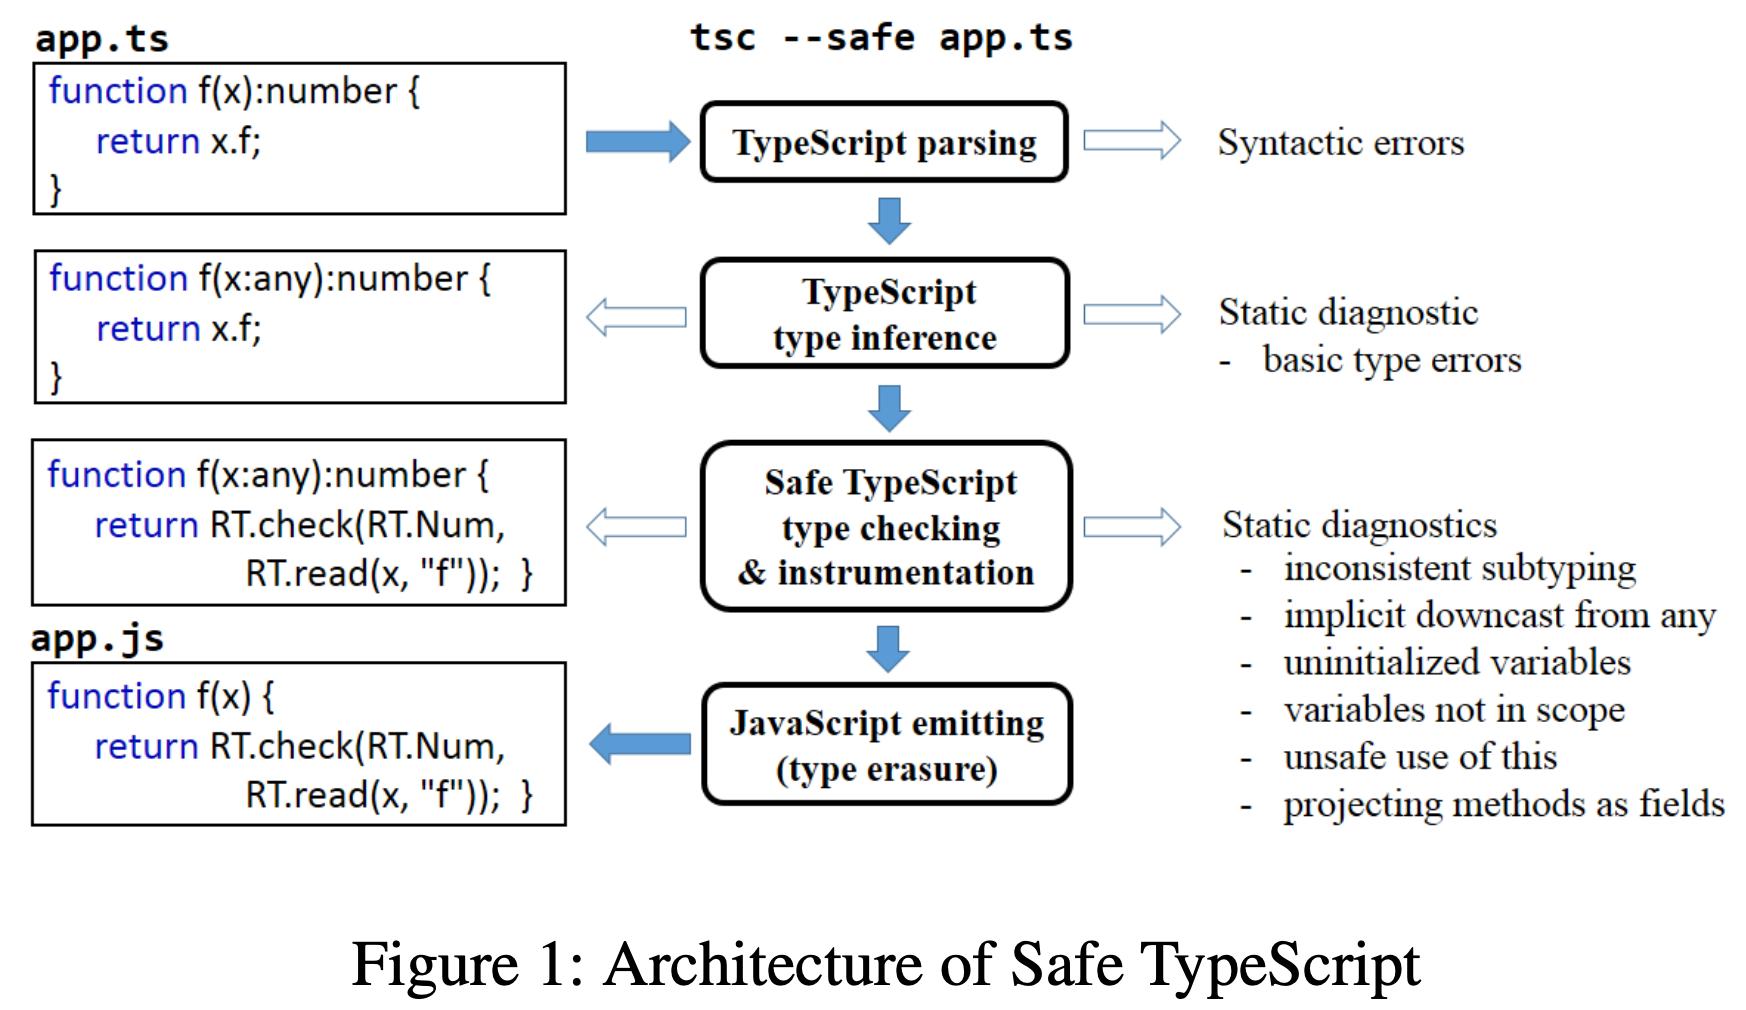 Figure 1: Architecture of Safe TypeScript